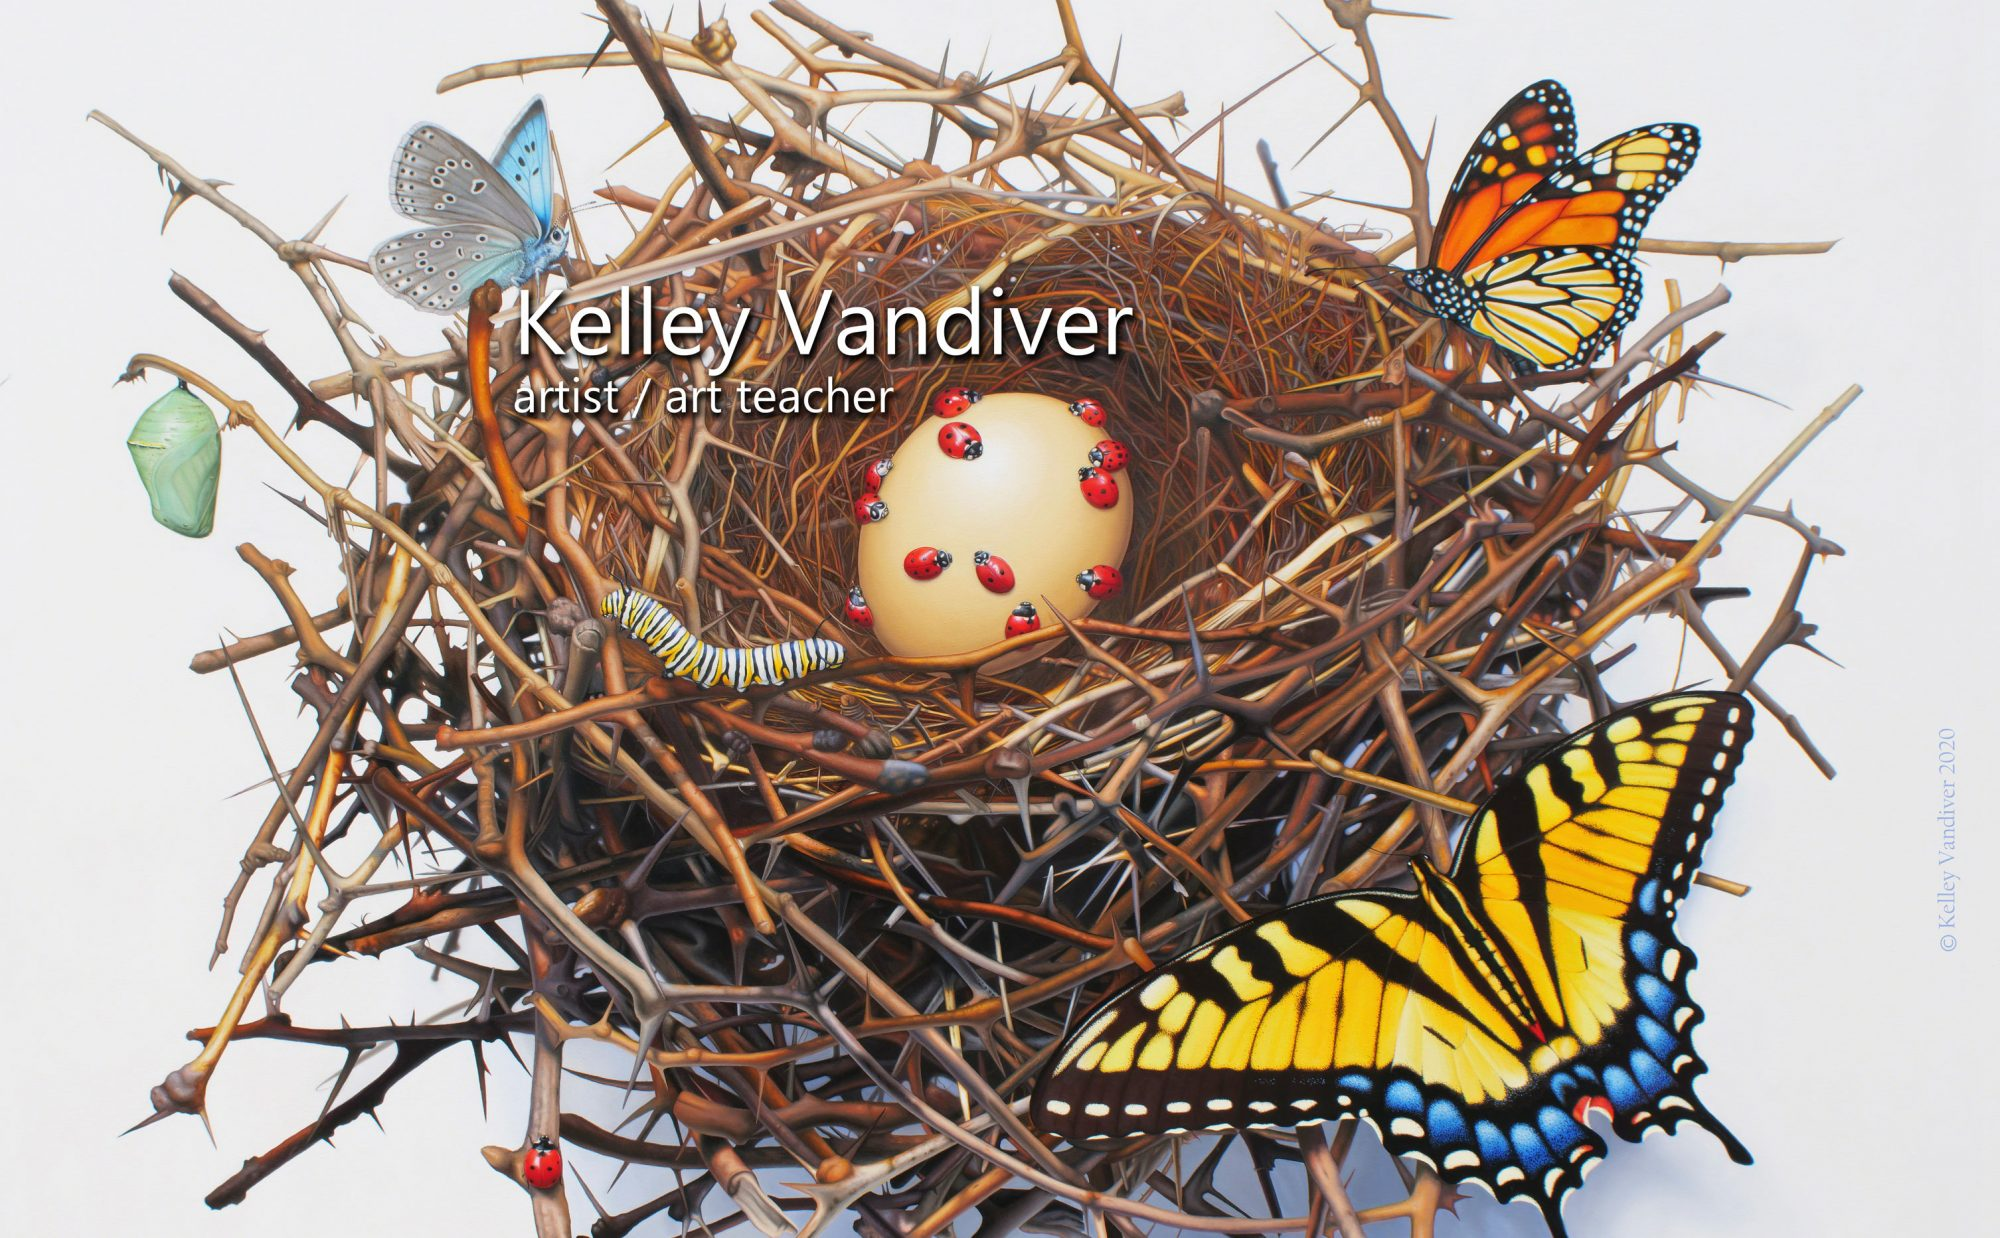 KELLEY VANDIVER